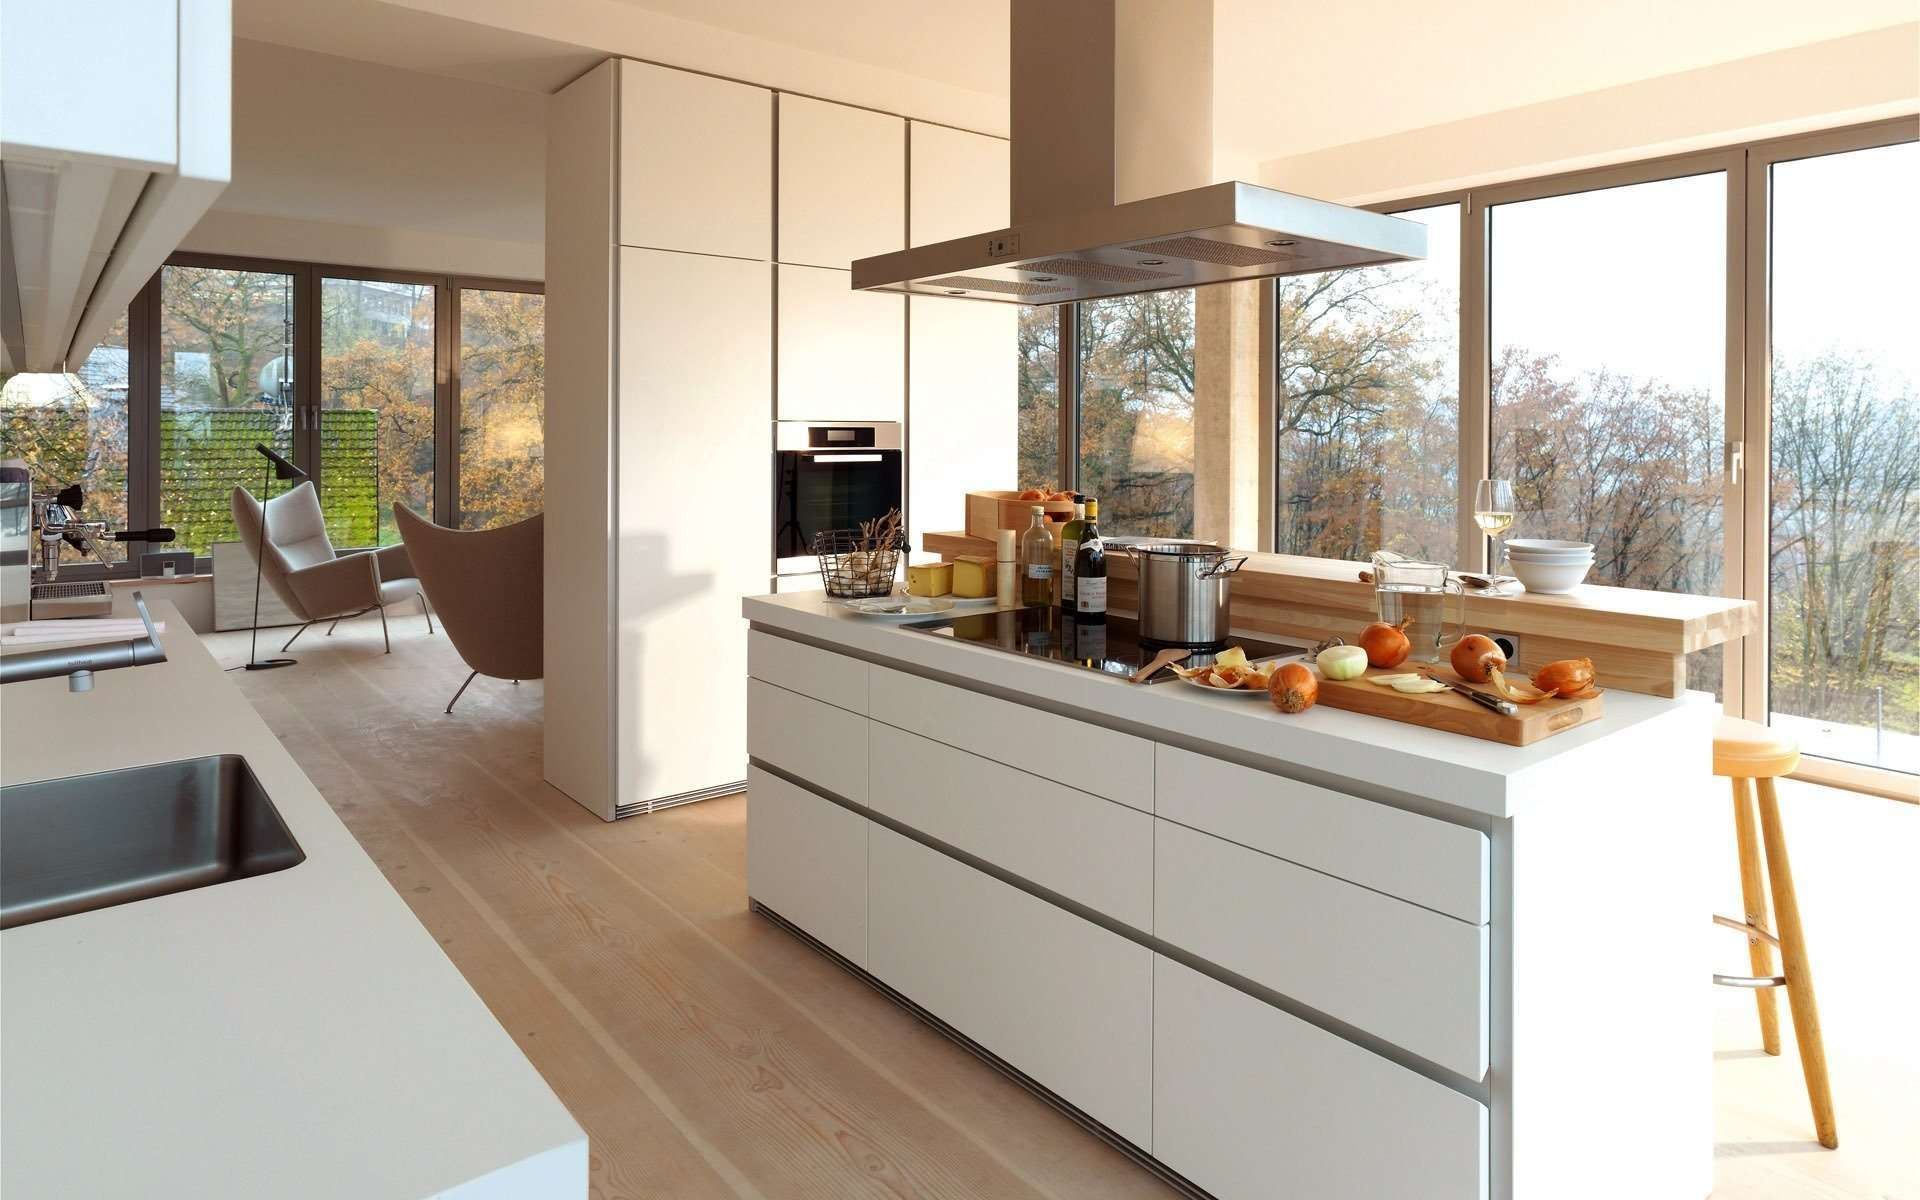 dream modern kitchen kitchens galore kitchen decor kitchen rh pinterest com au